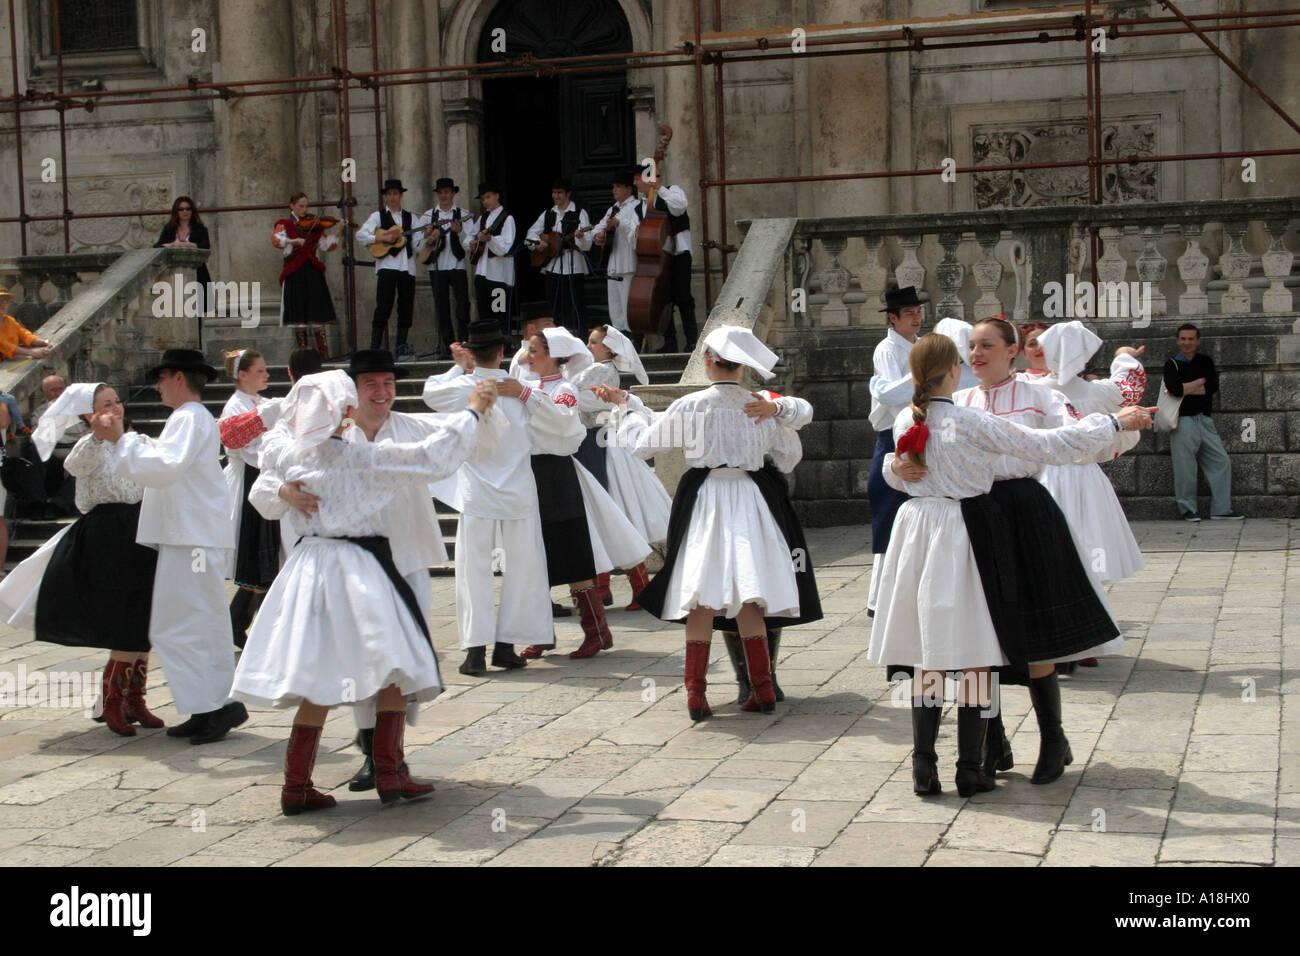 CROATIA - Dubrovnik Folk Music Festival - Stock Image